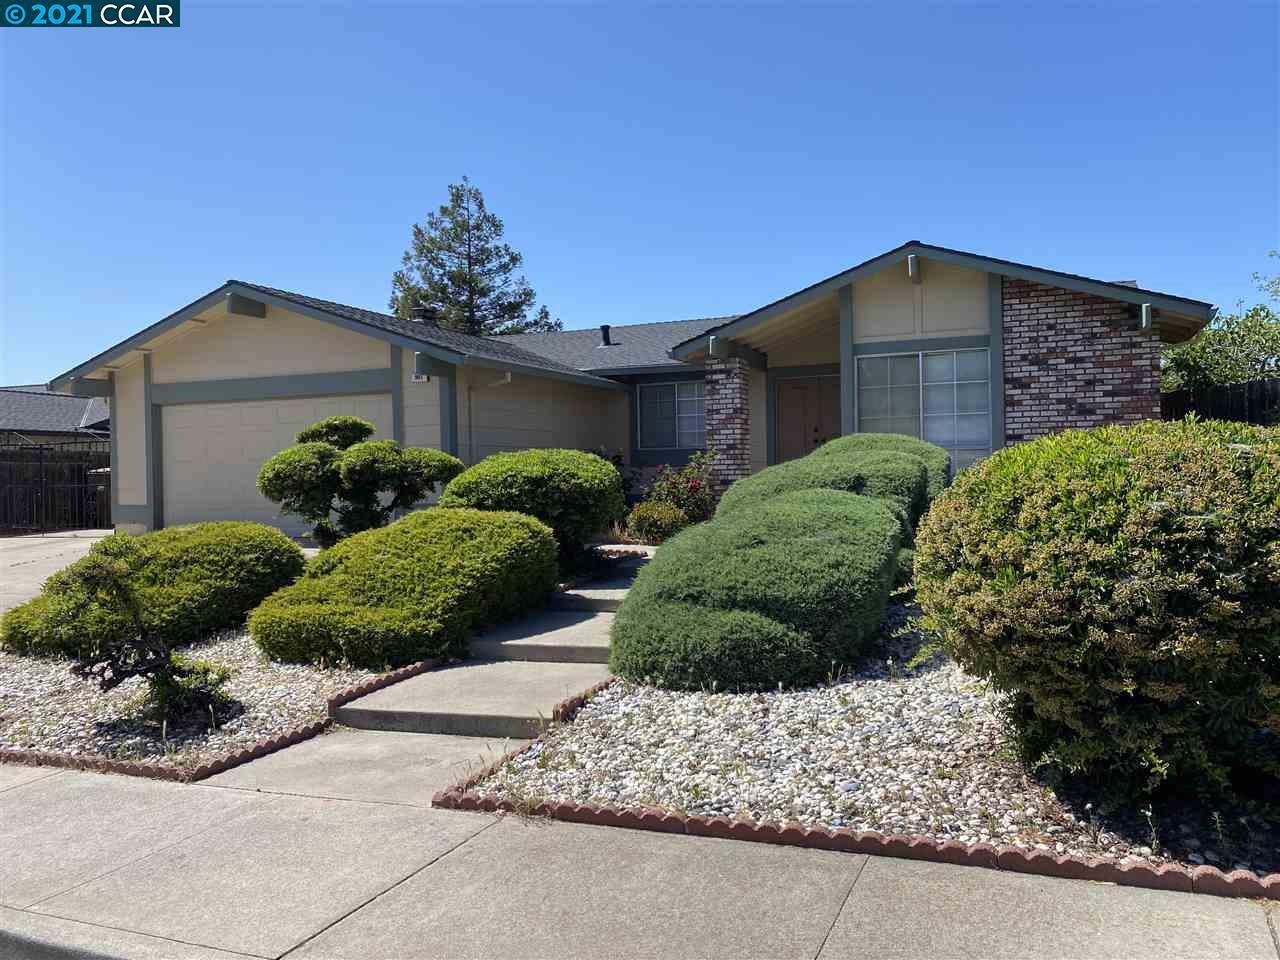 901 Basalt Way, Antioch, California 94509, 3 Bedrooms Bedrooms, ,2 BathroomsBathrooms,Single Family,For Sale,901 Basalt Way,1,40948562